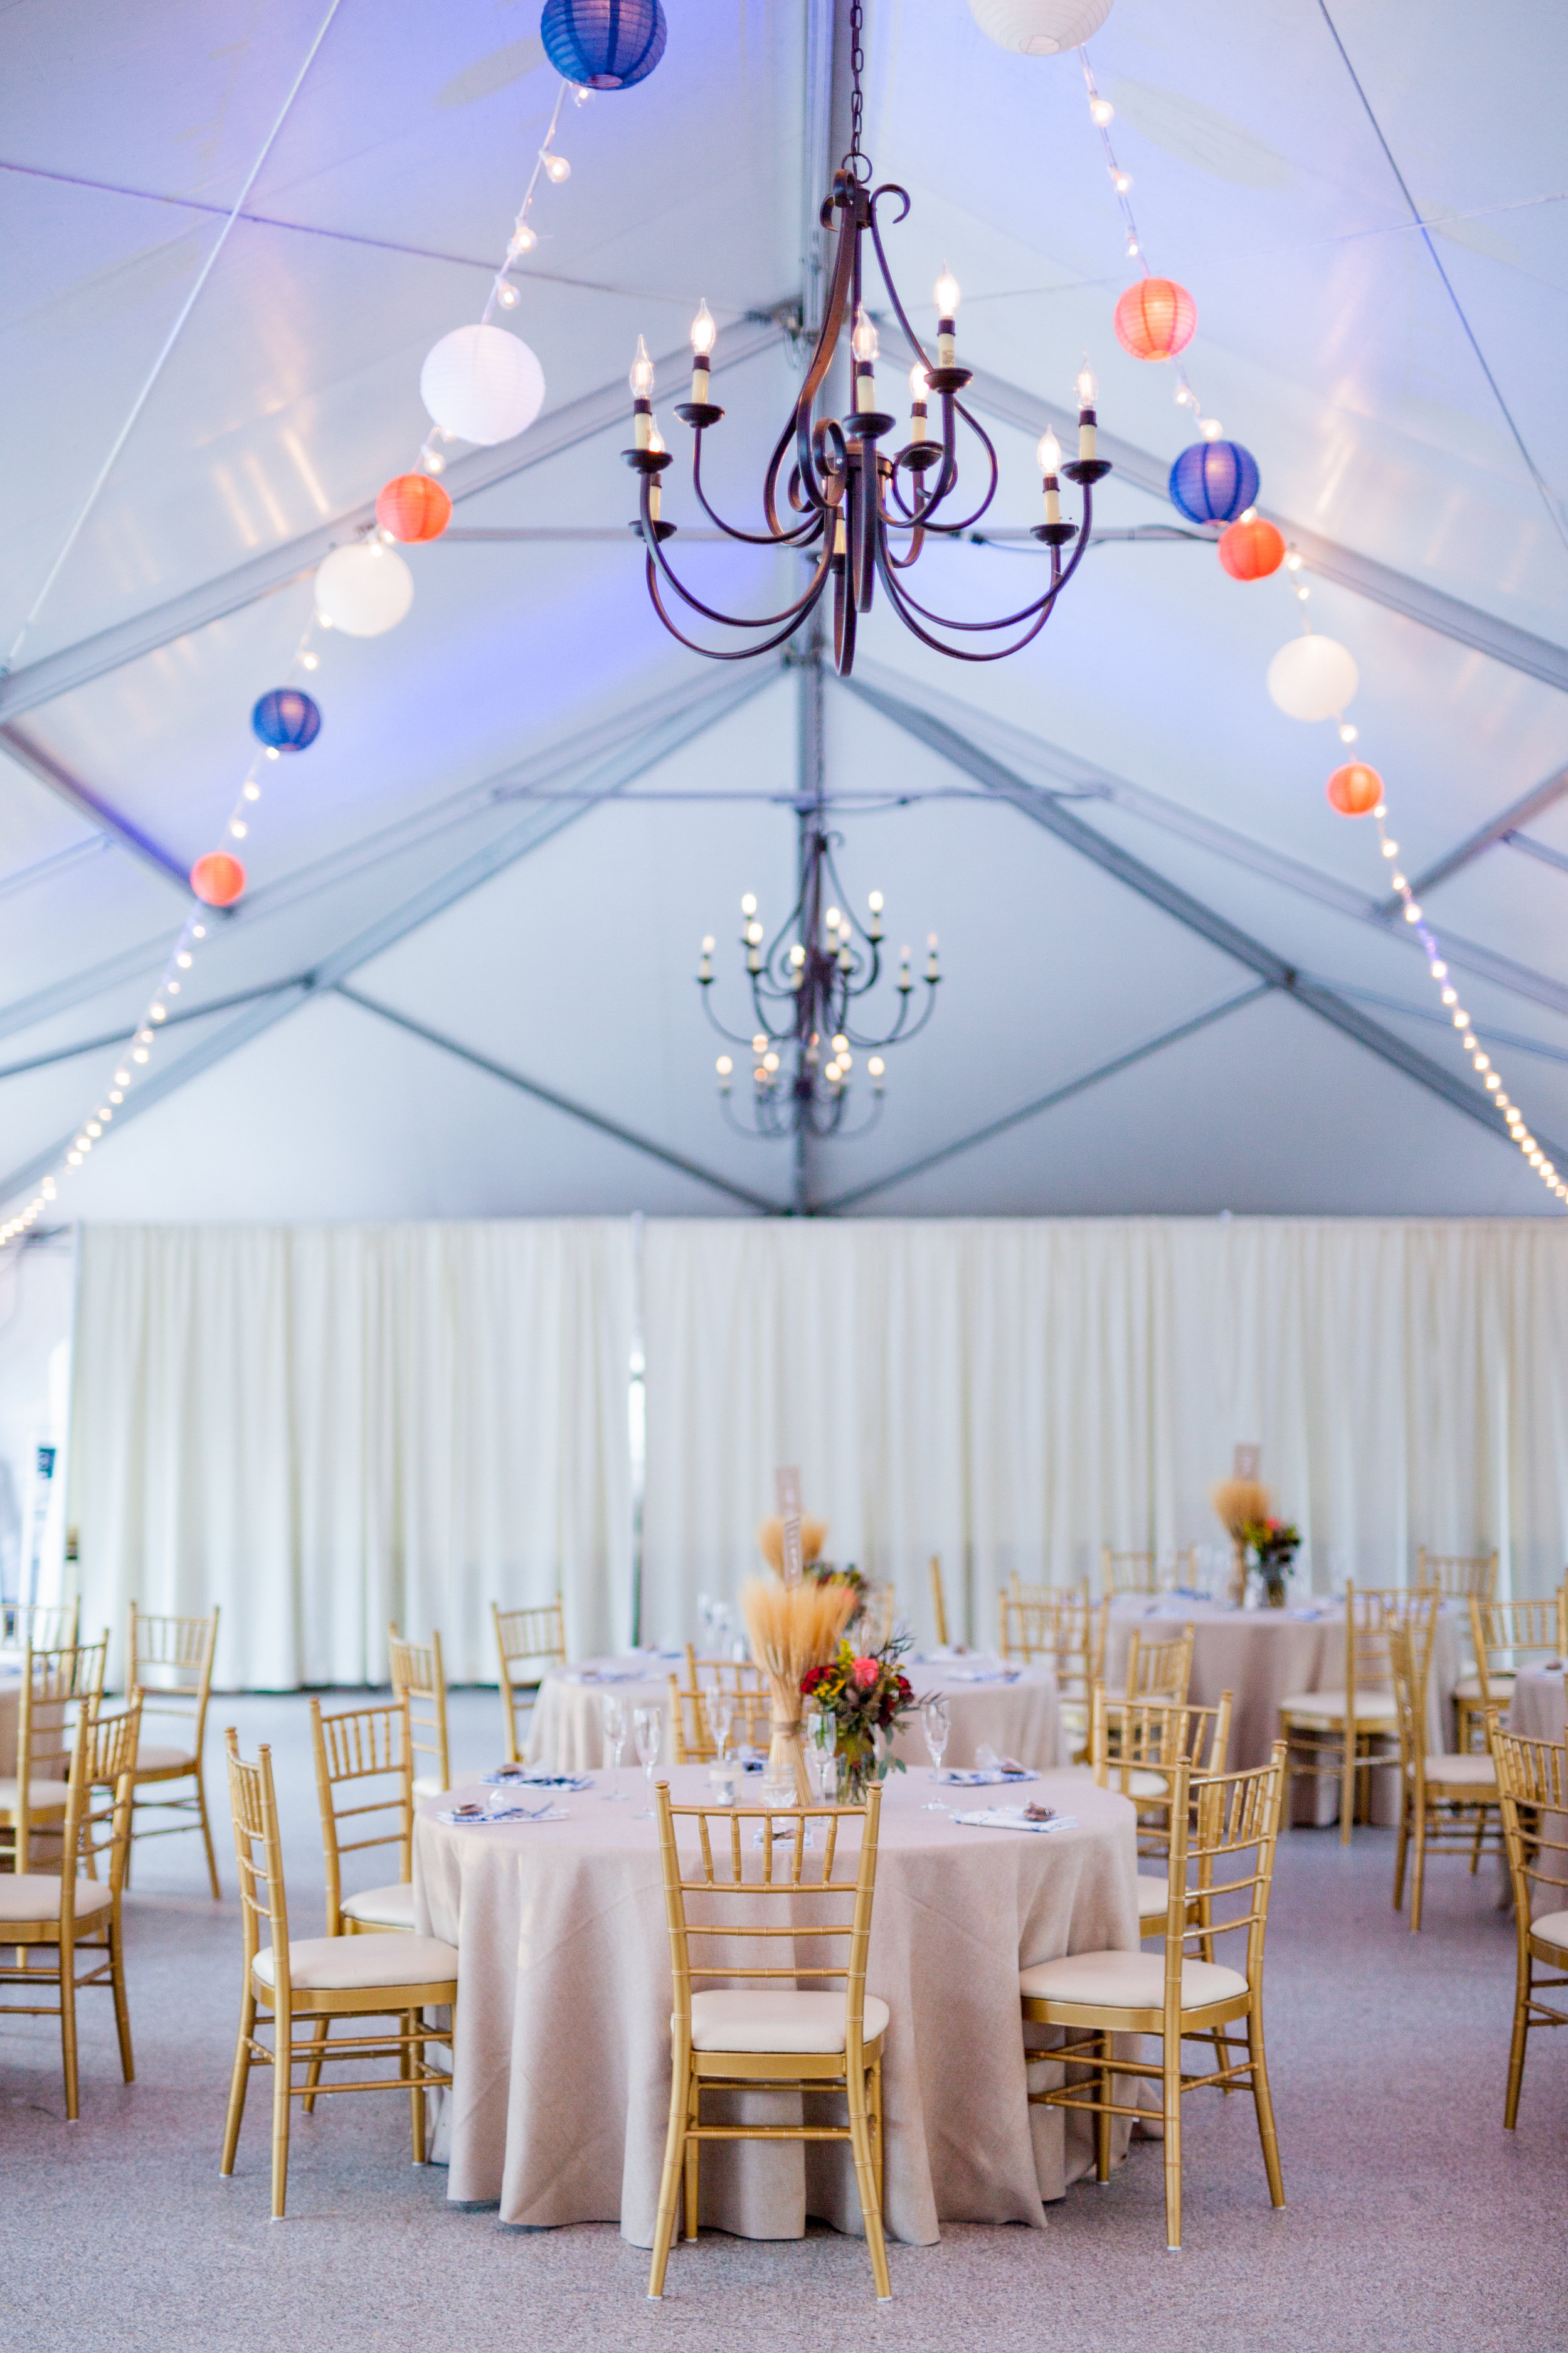 Wedding Reception at Rust Manor in Leesburg VA